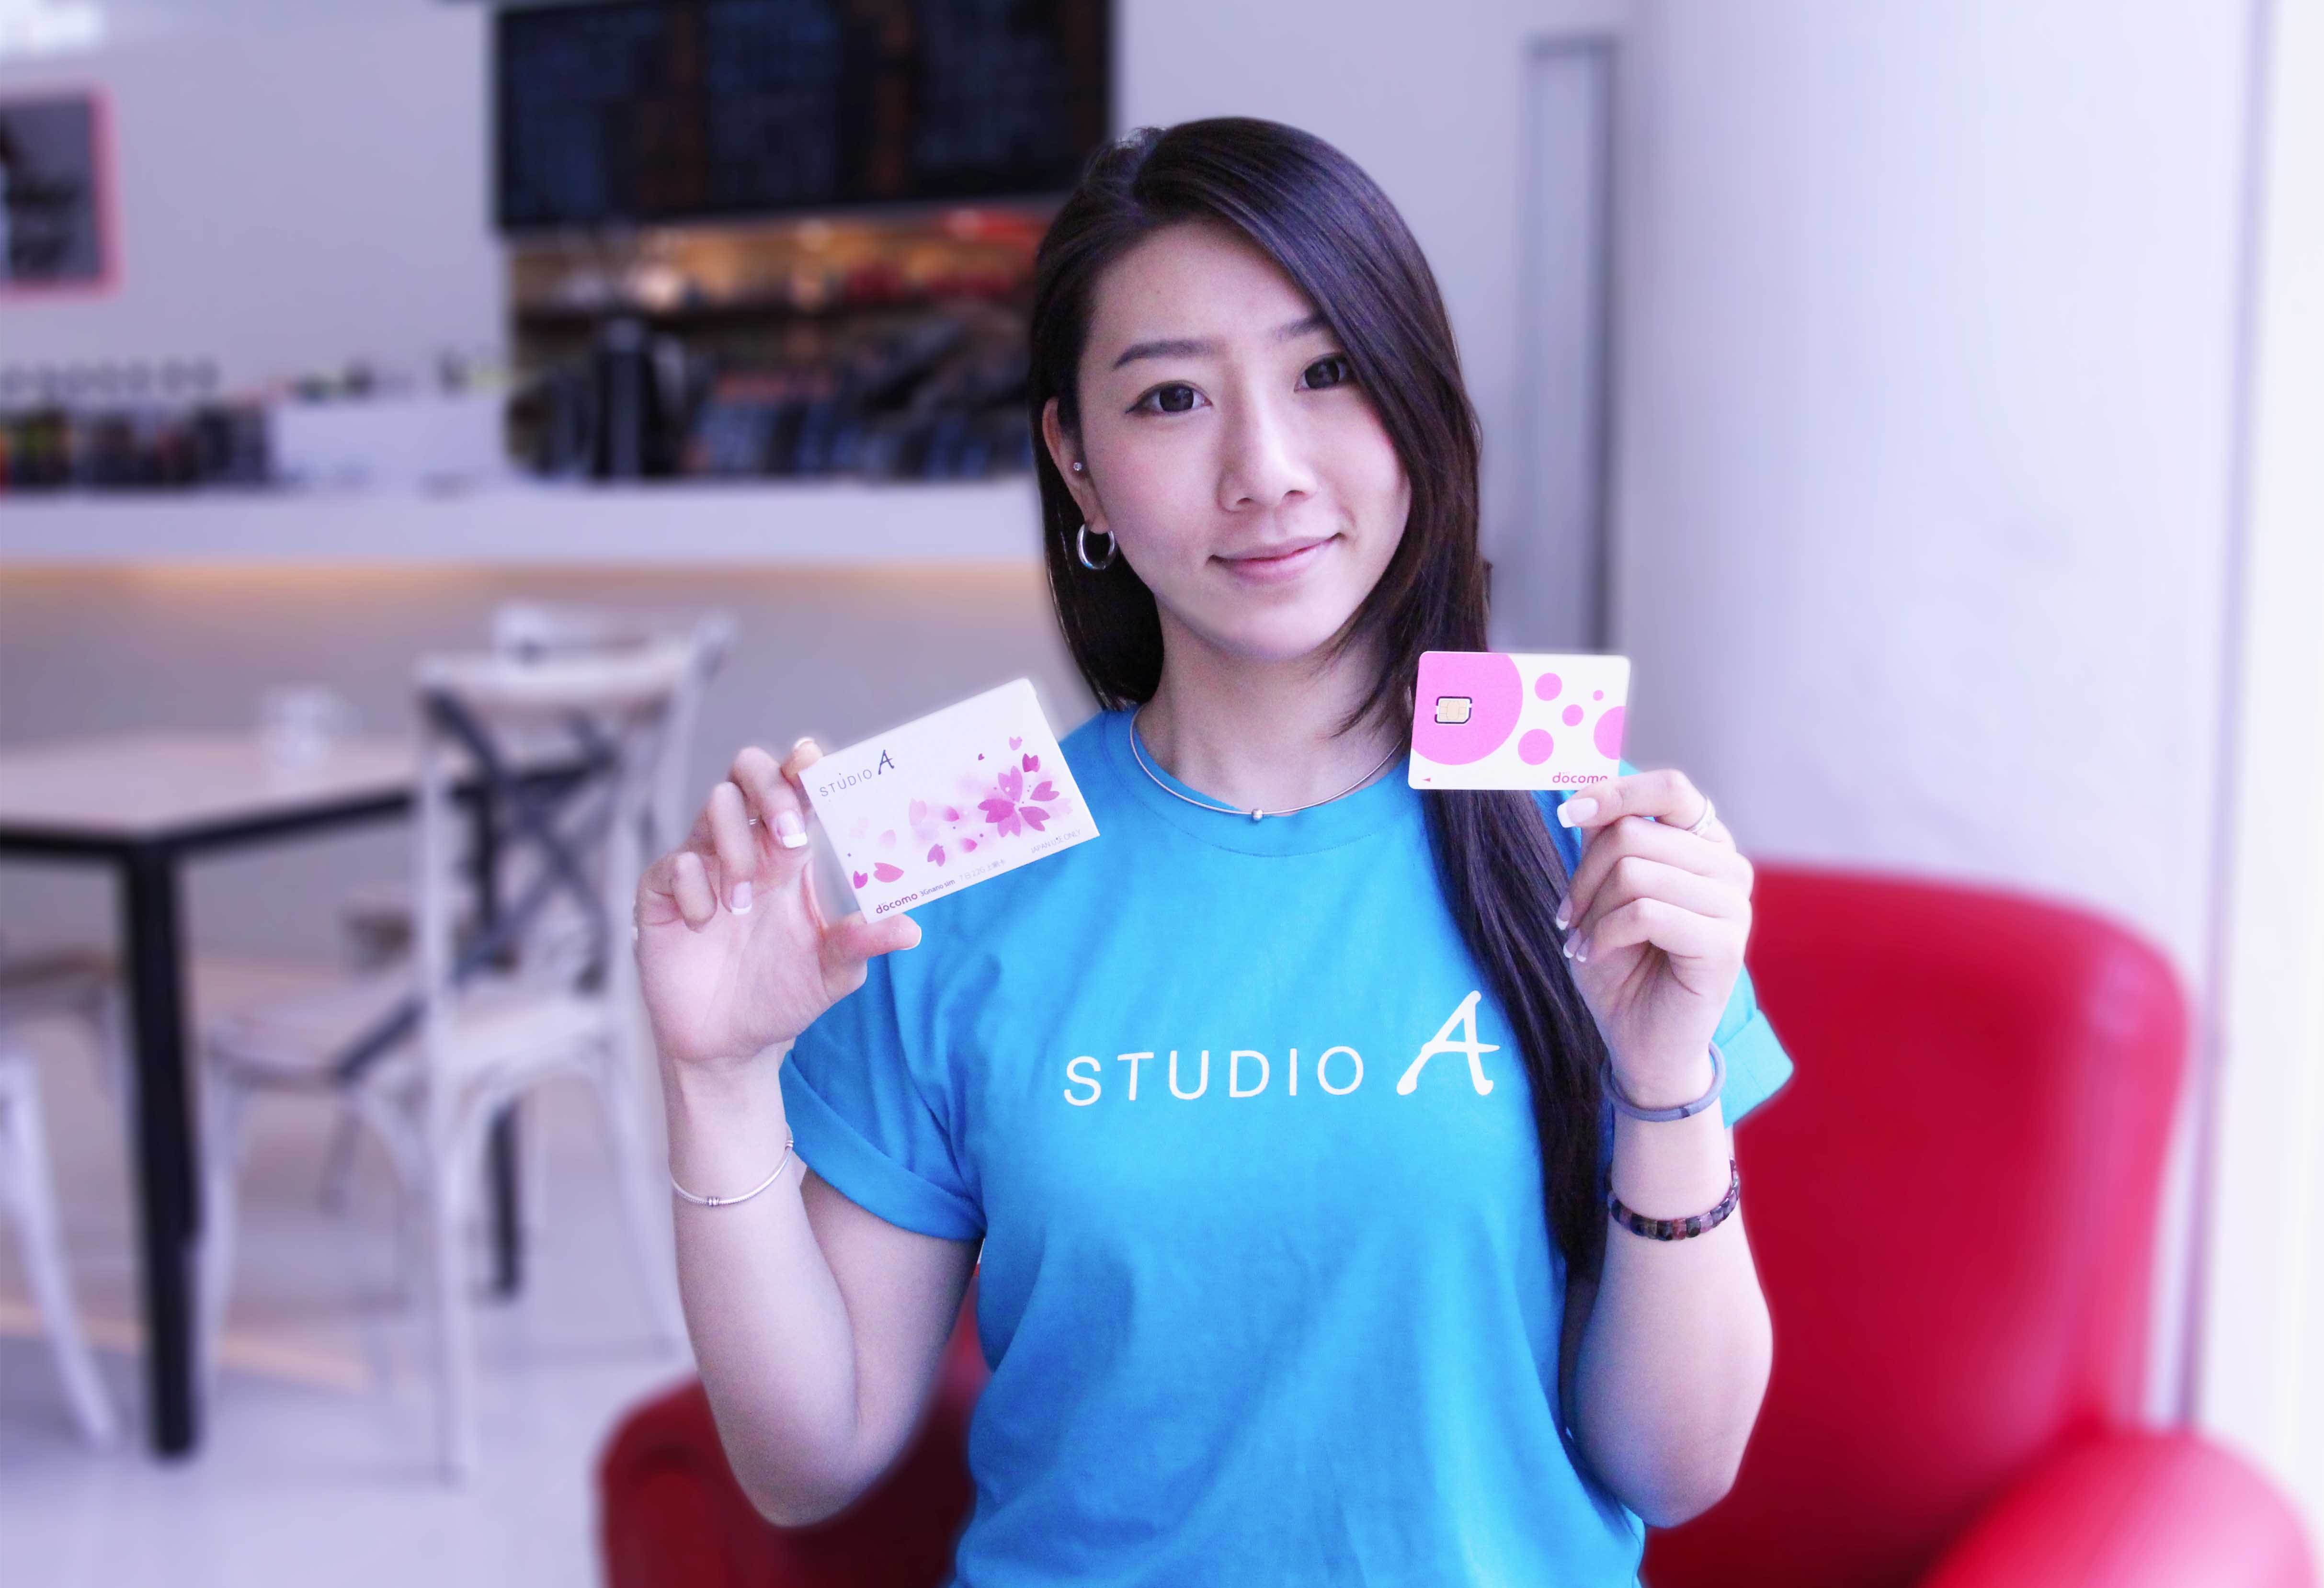 STUDIO A×Docomo日本無線上網卡 7天完整2.2G LTE高速上網  每日百元有找 獨家以3G的價格 提供LTE高速上網服務!